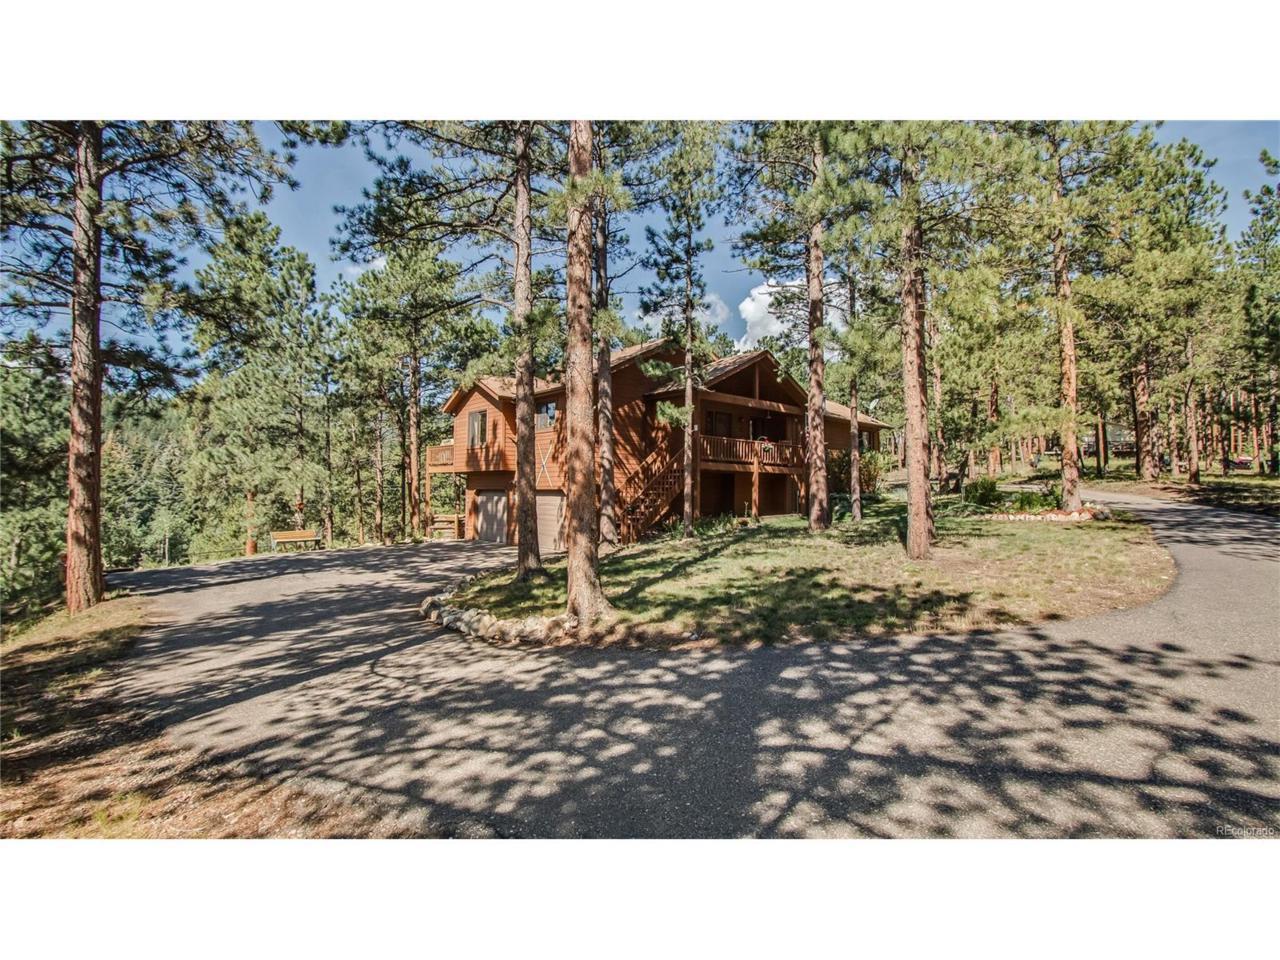 27900 Hidden Trail, Conifer, CO 80433 (MLS #8913455) :: 8z Real Estate